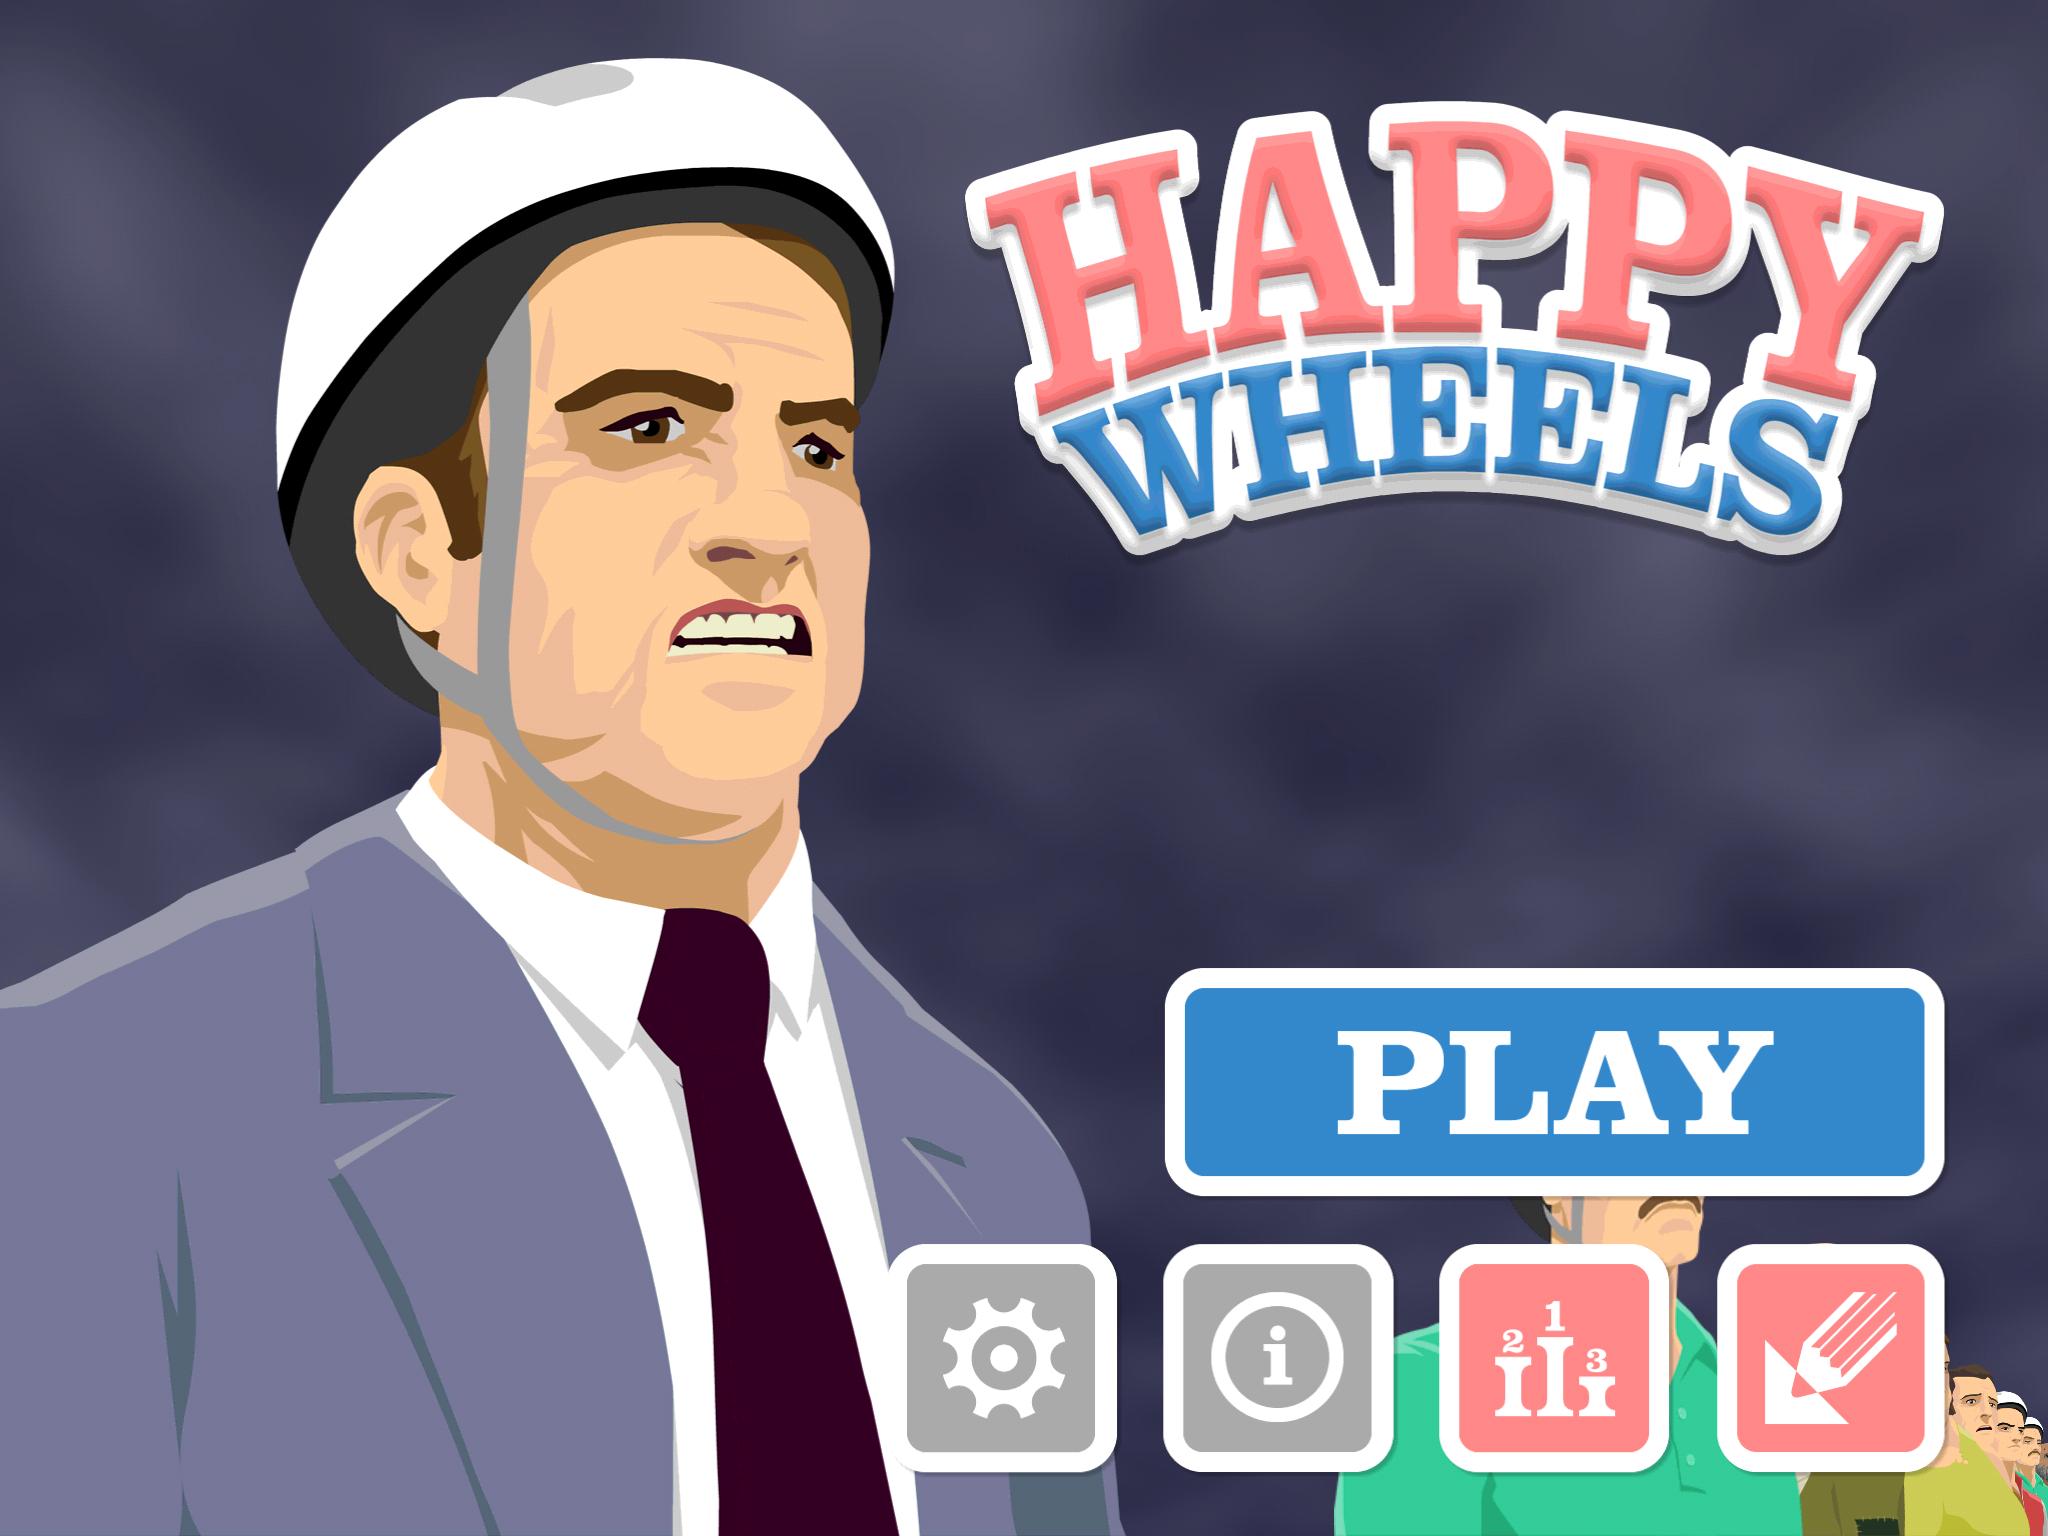 20150825-happywheels-eyecatch